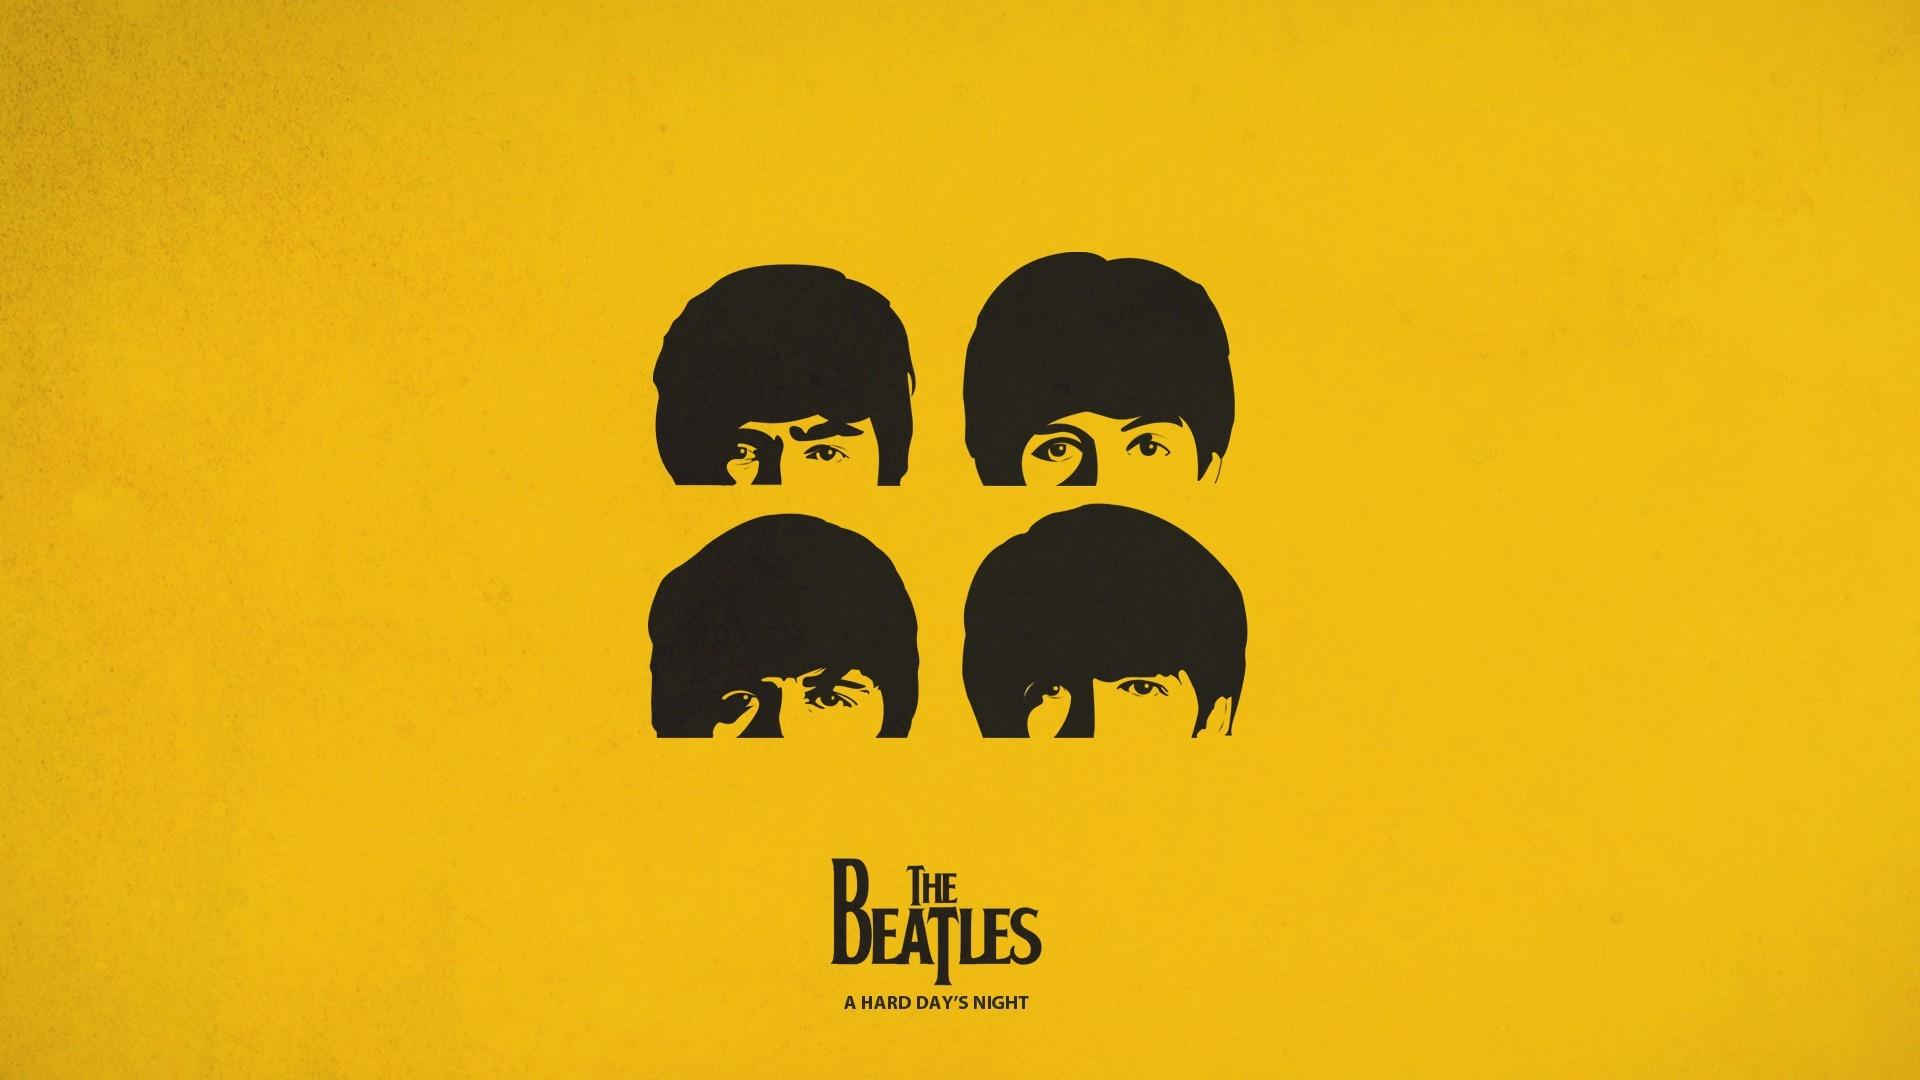 Illustration Minimalism Text Logo Yellow Graphic Design Circle The Beatles Poster Brand Font